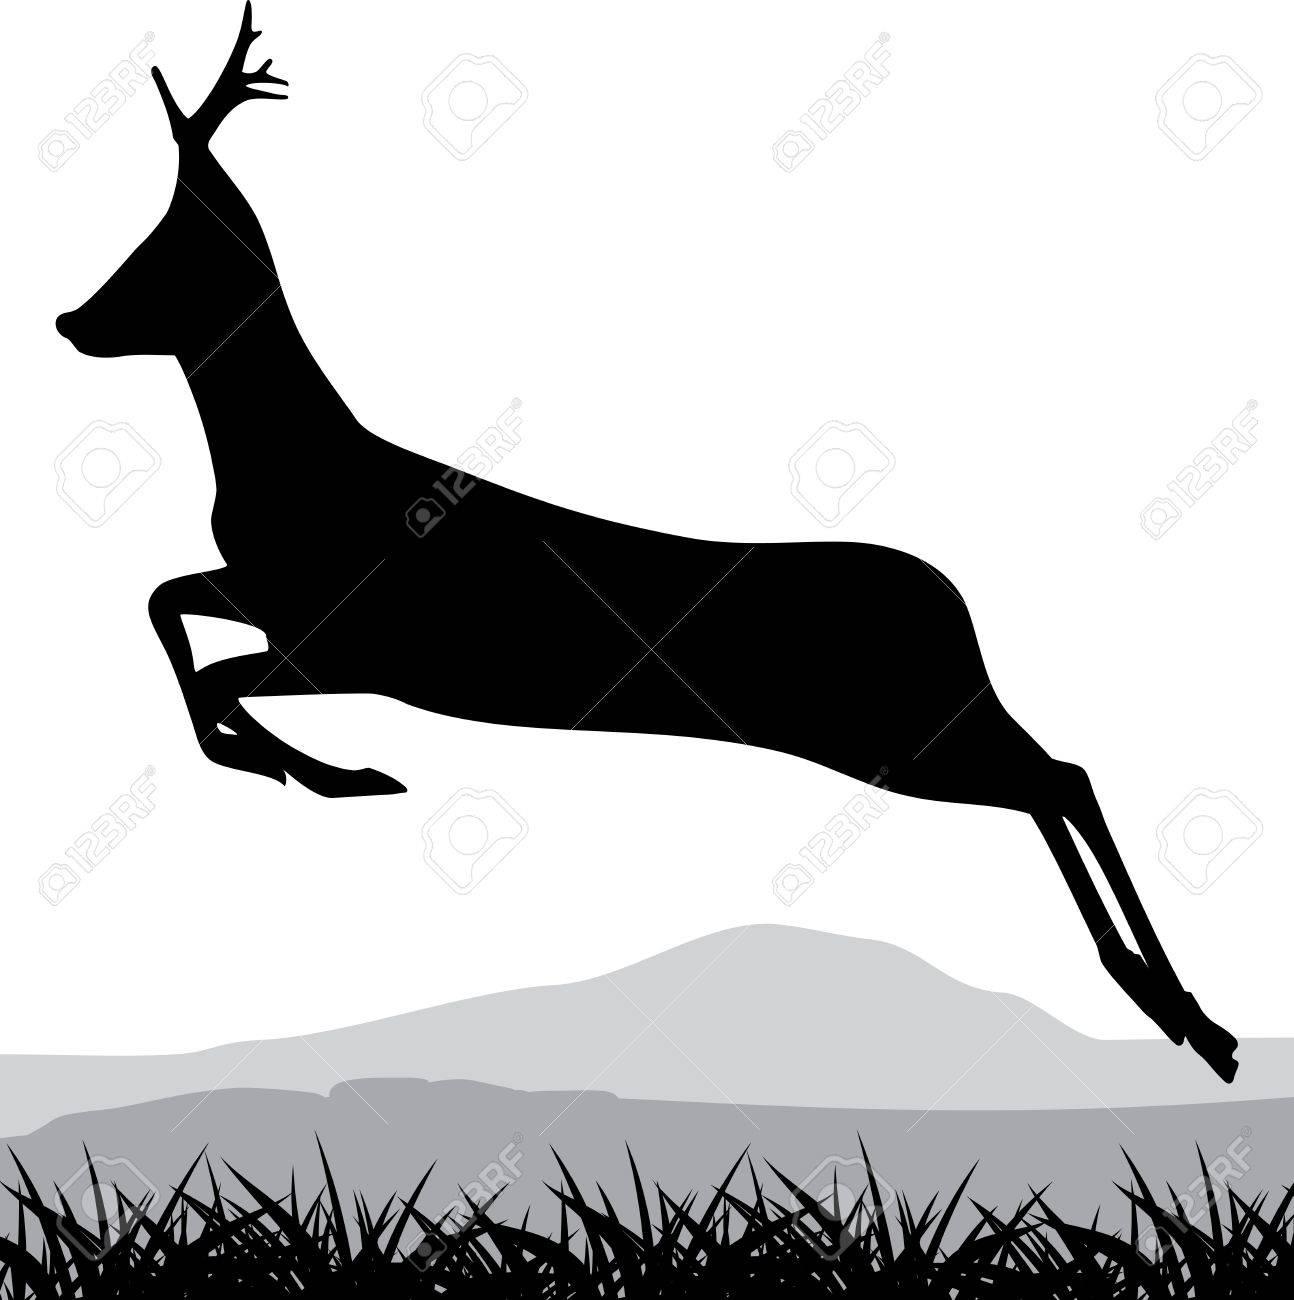 silhouette of a running deer stock vector 16270946